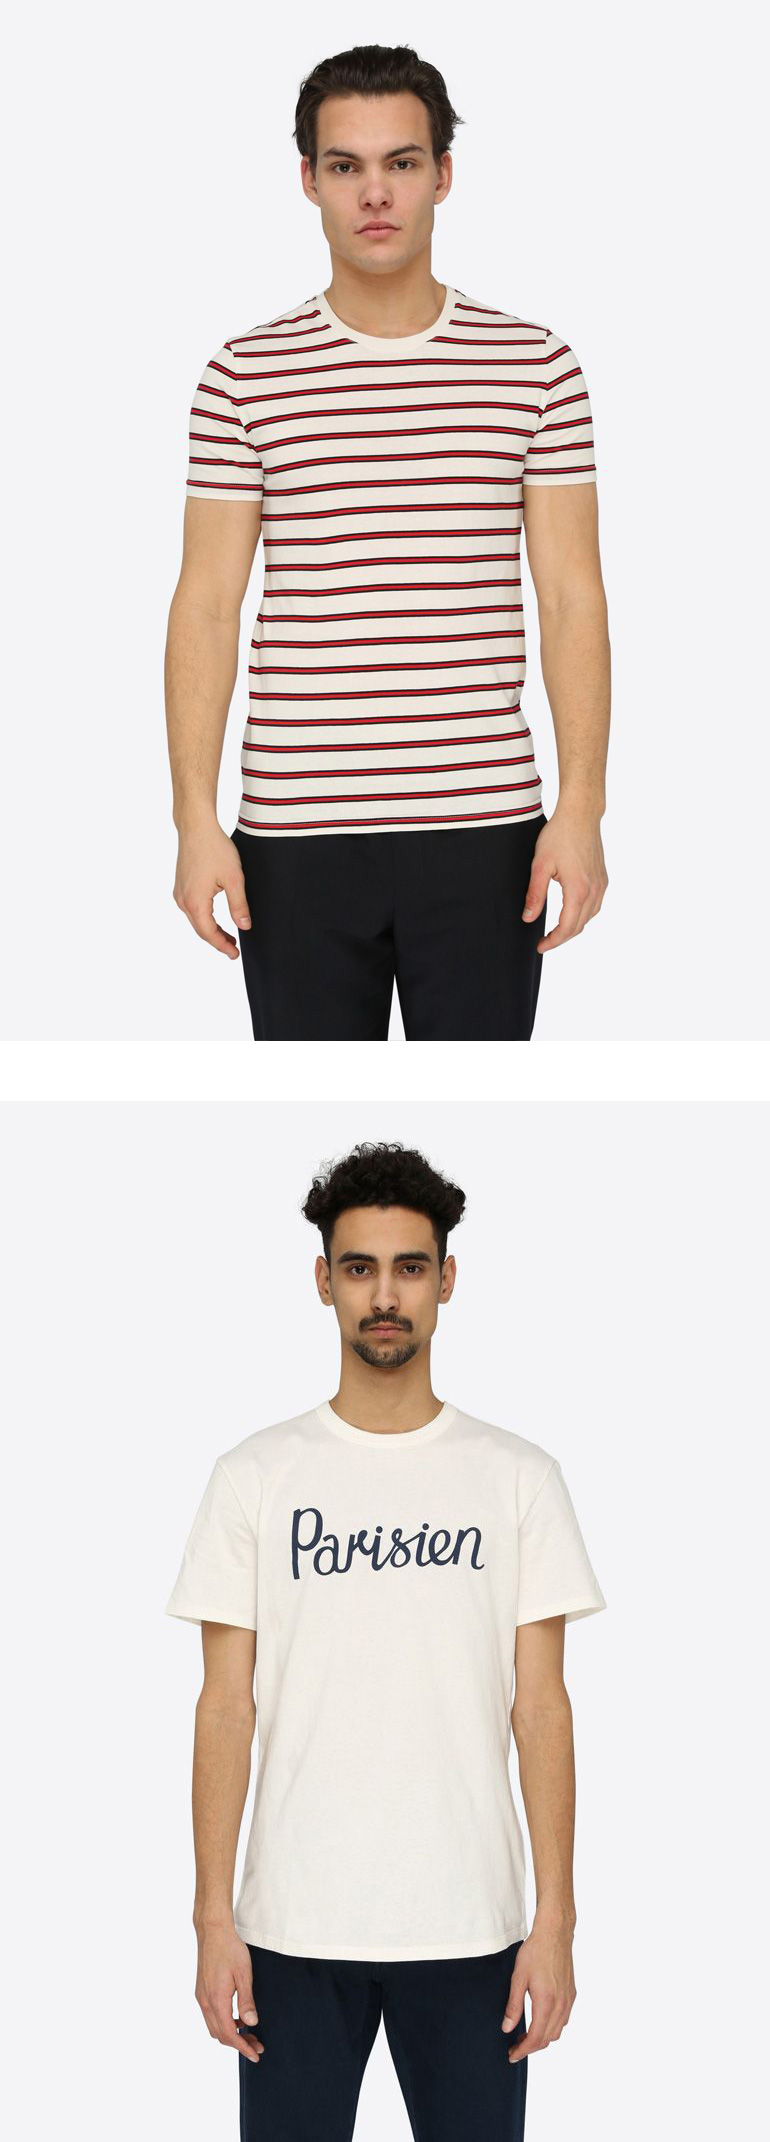 Opumo-T-shirts-2